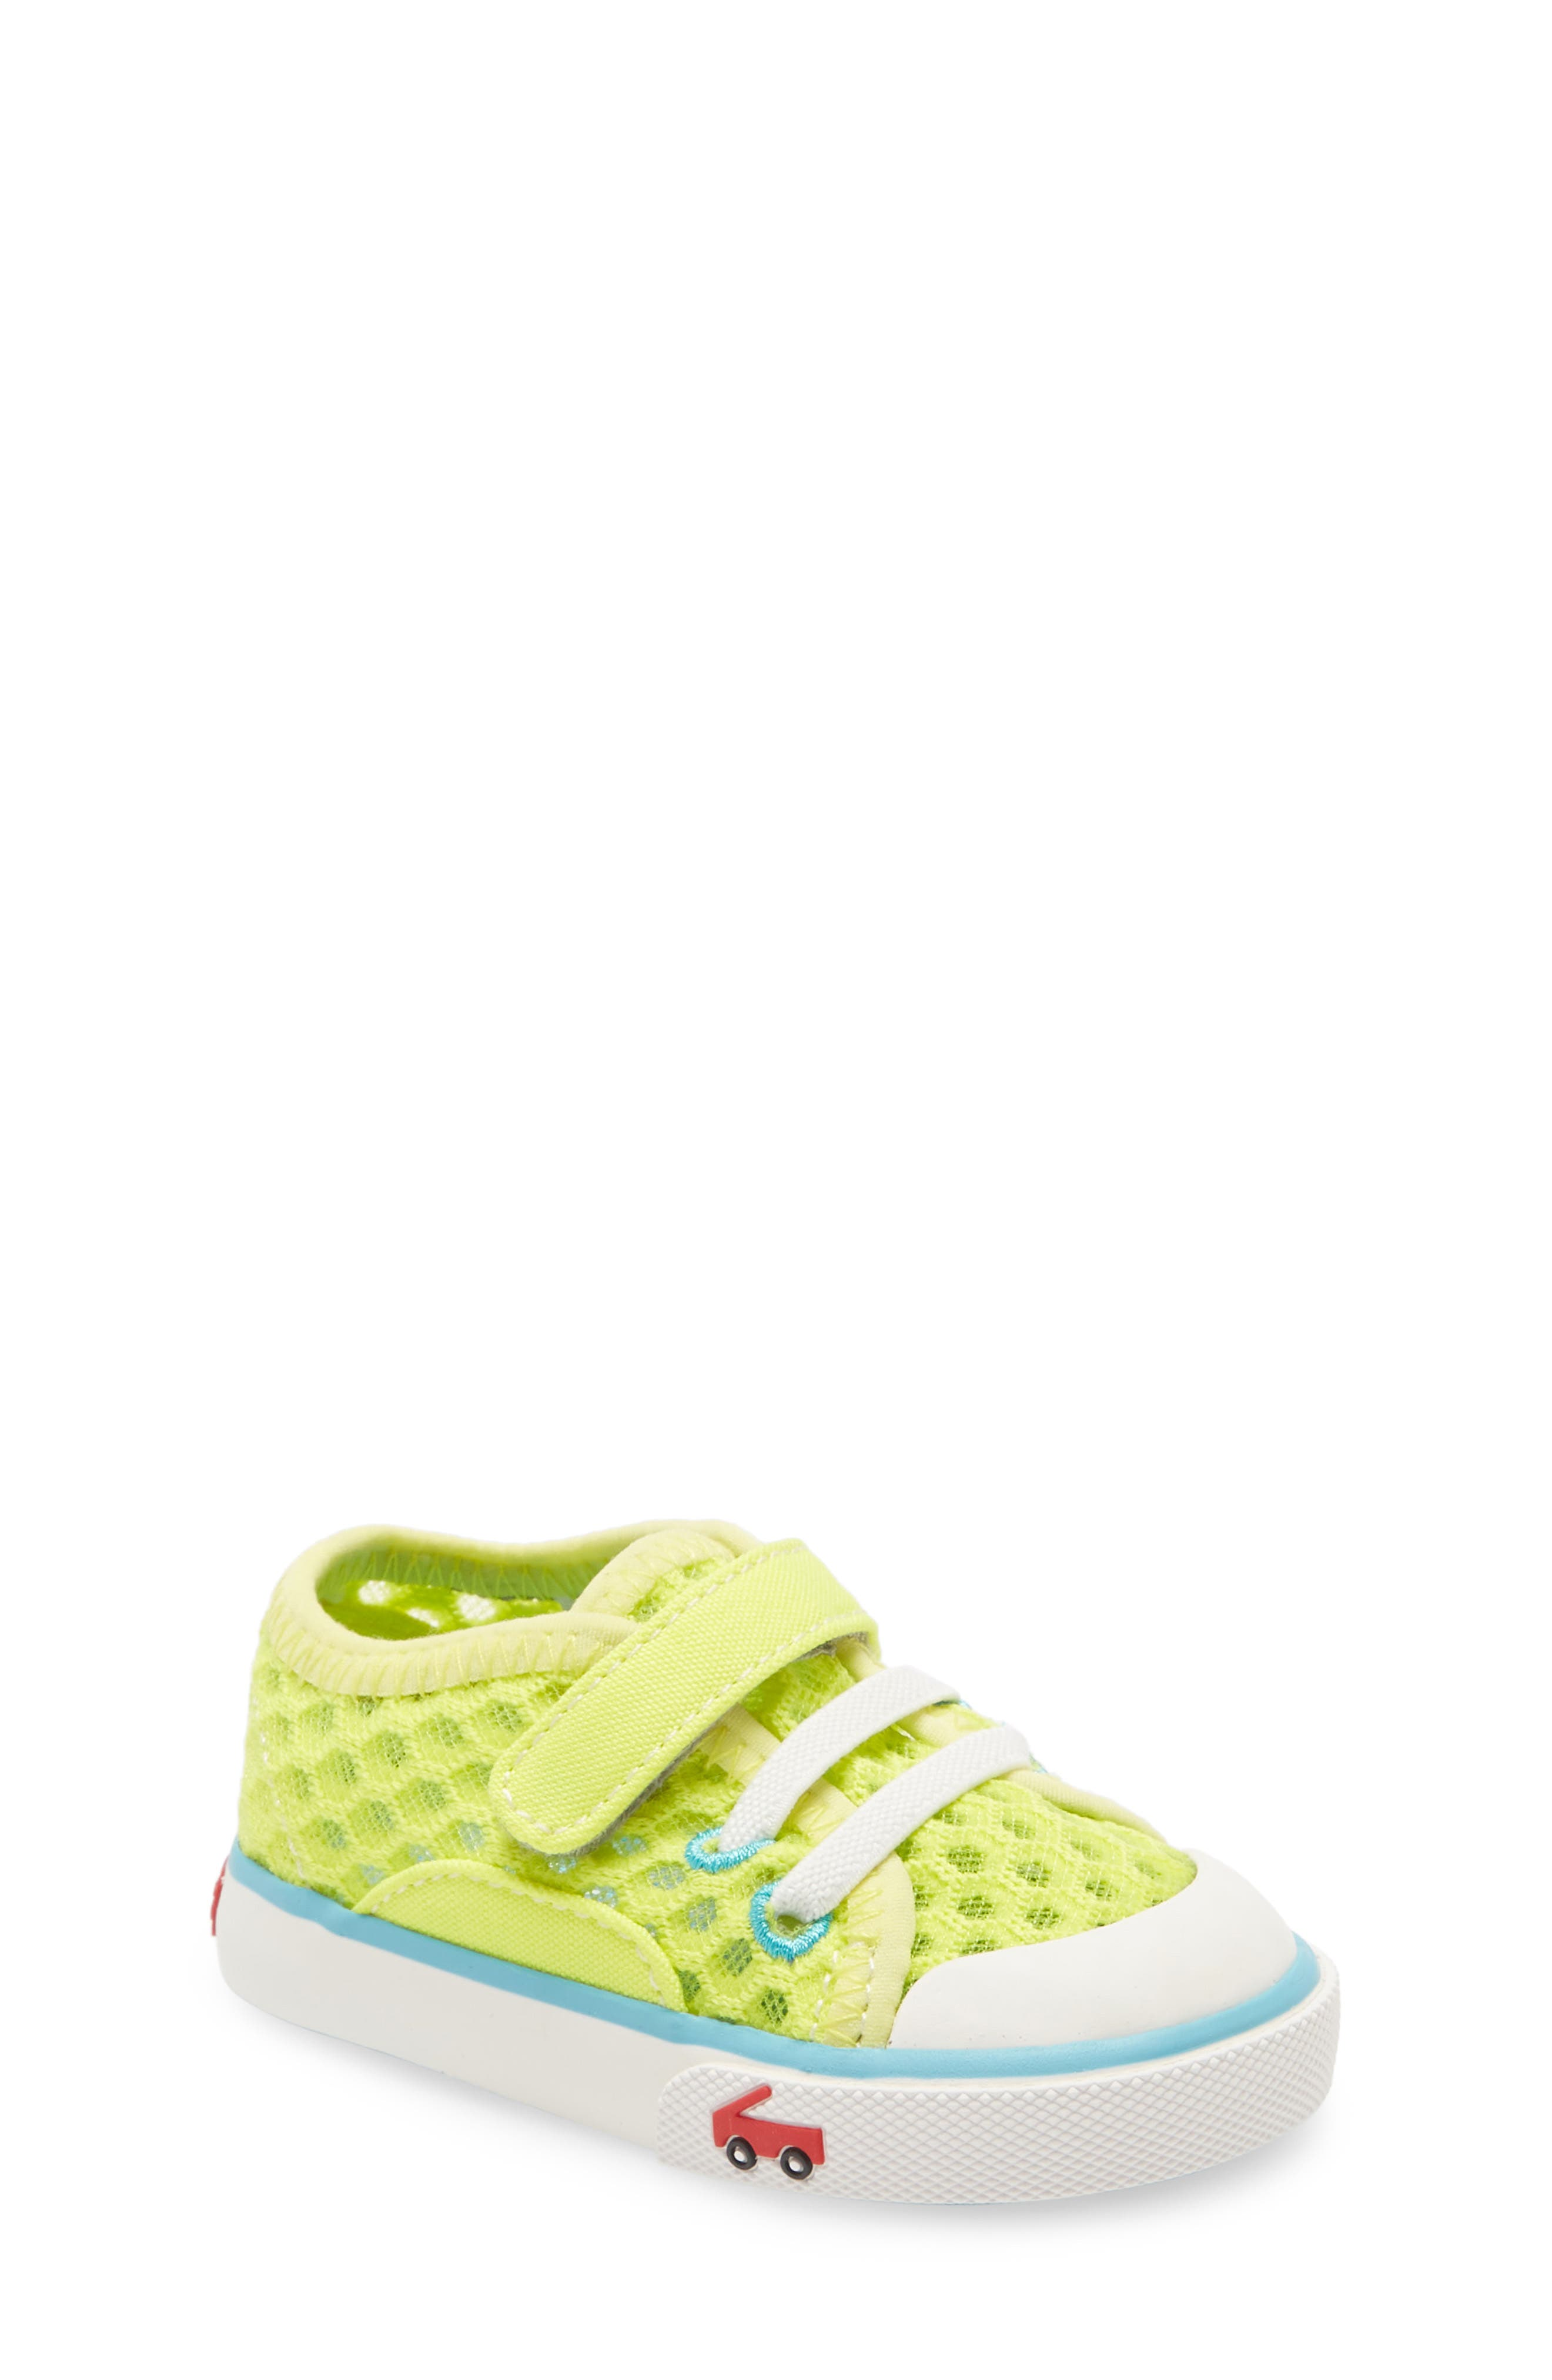 Image of See Kai Run Saylor Sneaker